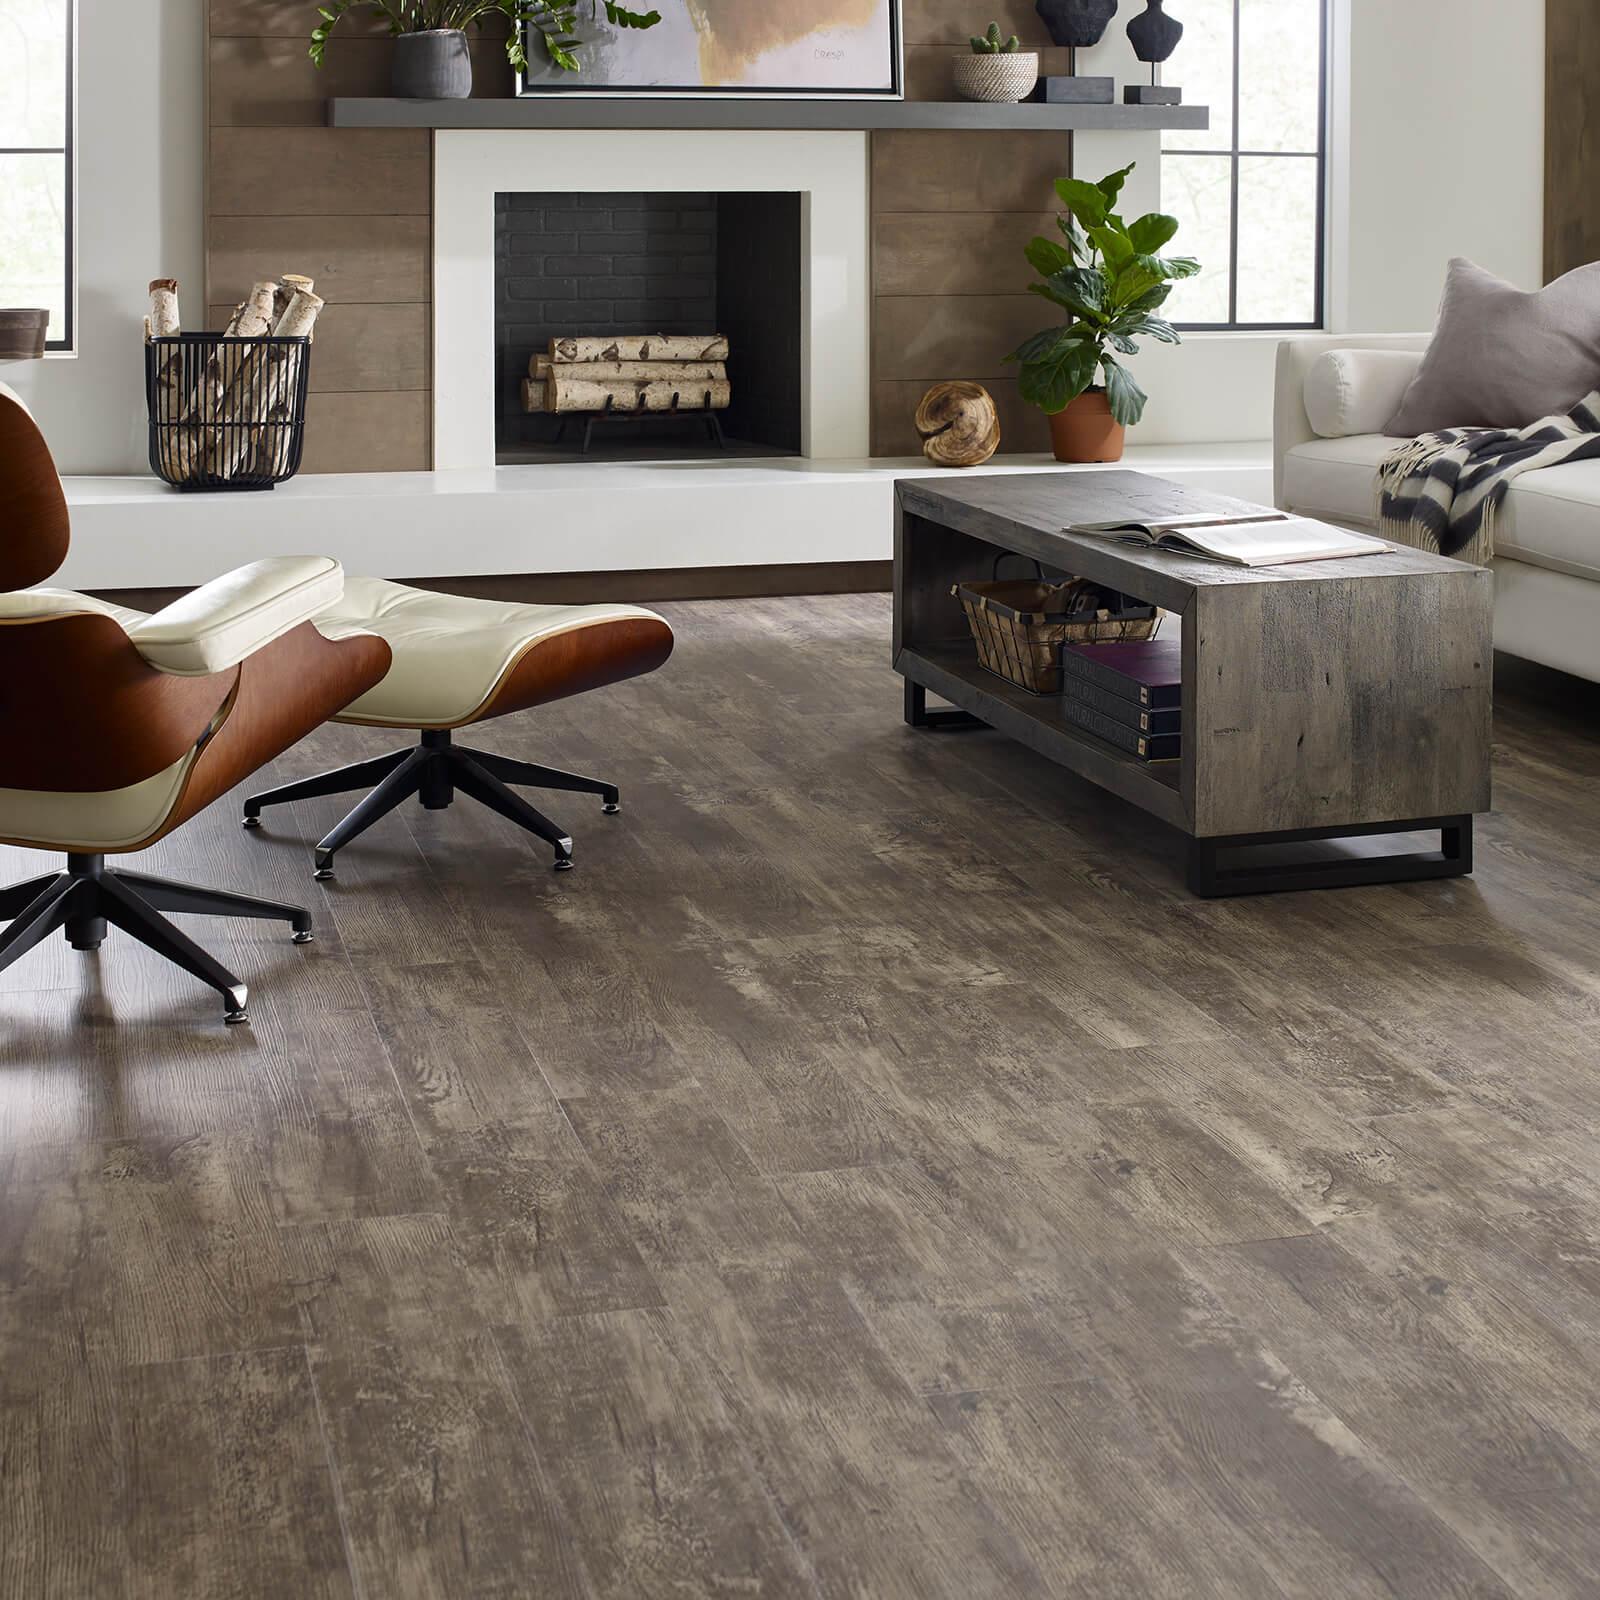 Shaw Paramount plus vinyl flooring   Flooring by Wilson's Carpet Plus